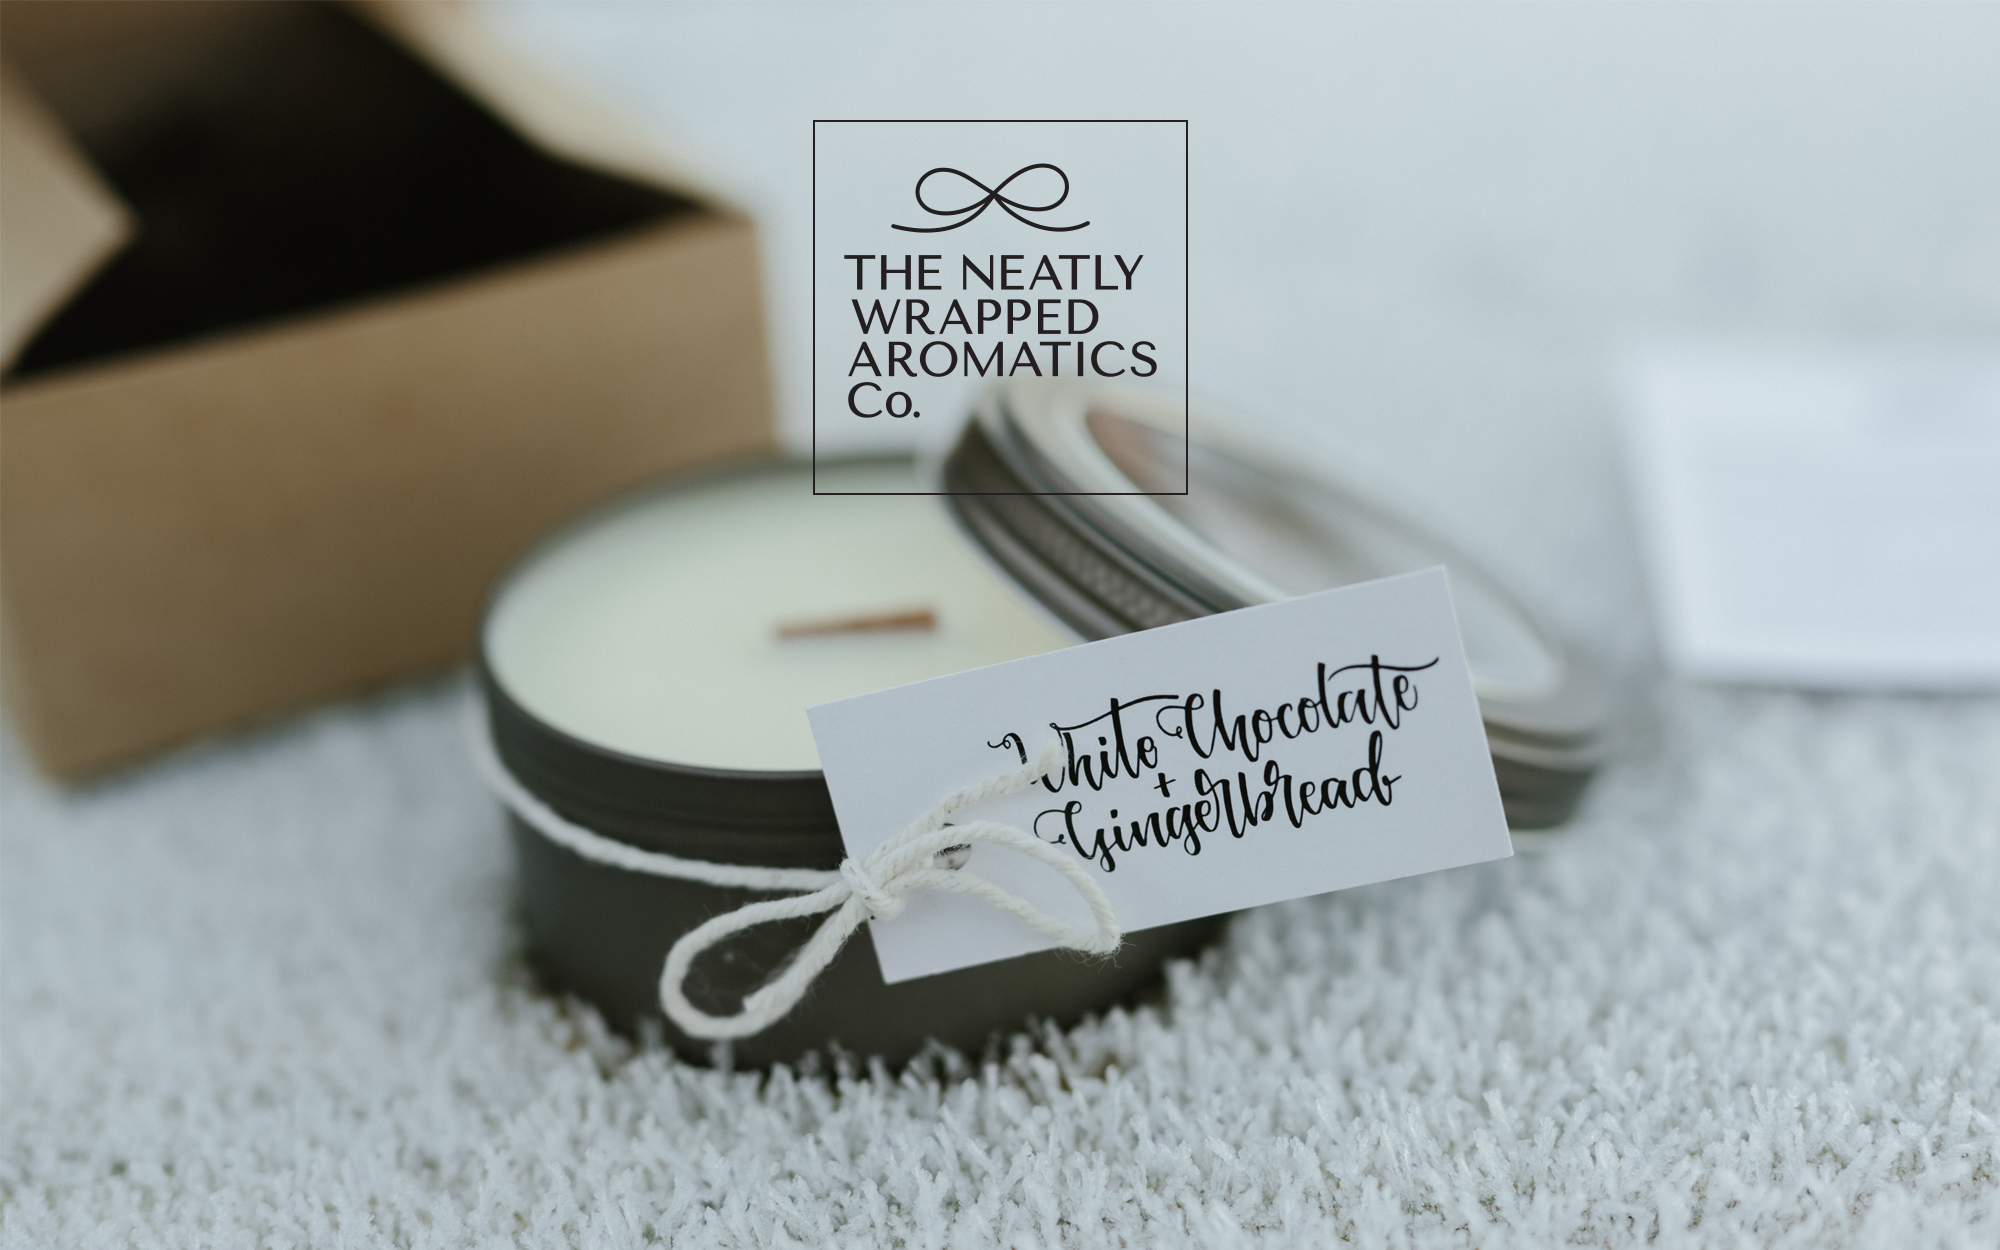 branding-logo-design-marketing-glasgow-scotland-candle-packaging-walnut-wasp.jpg